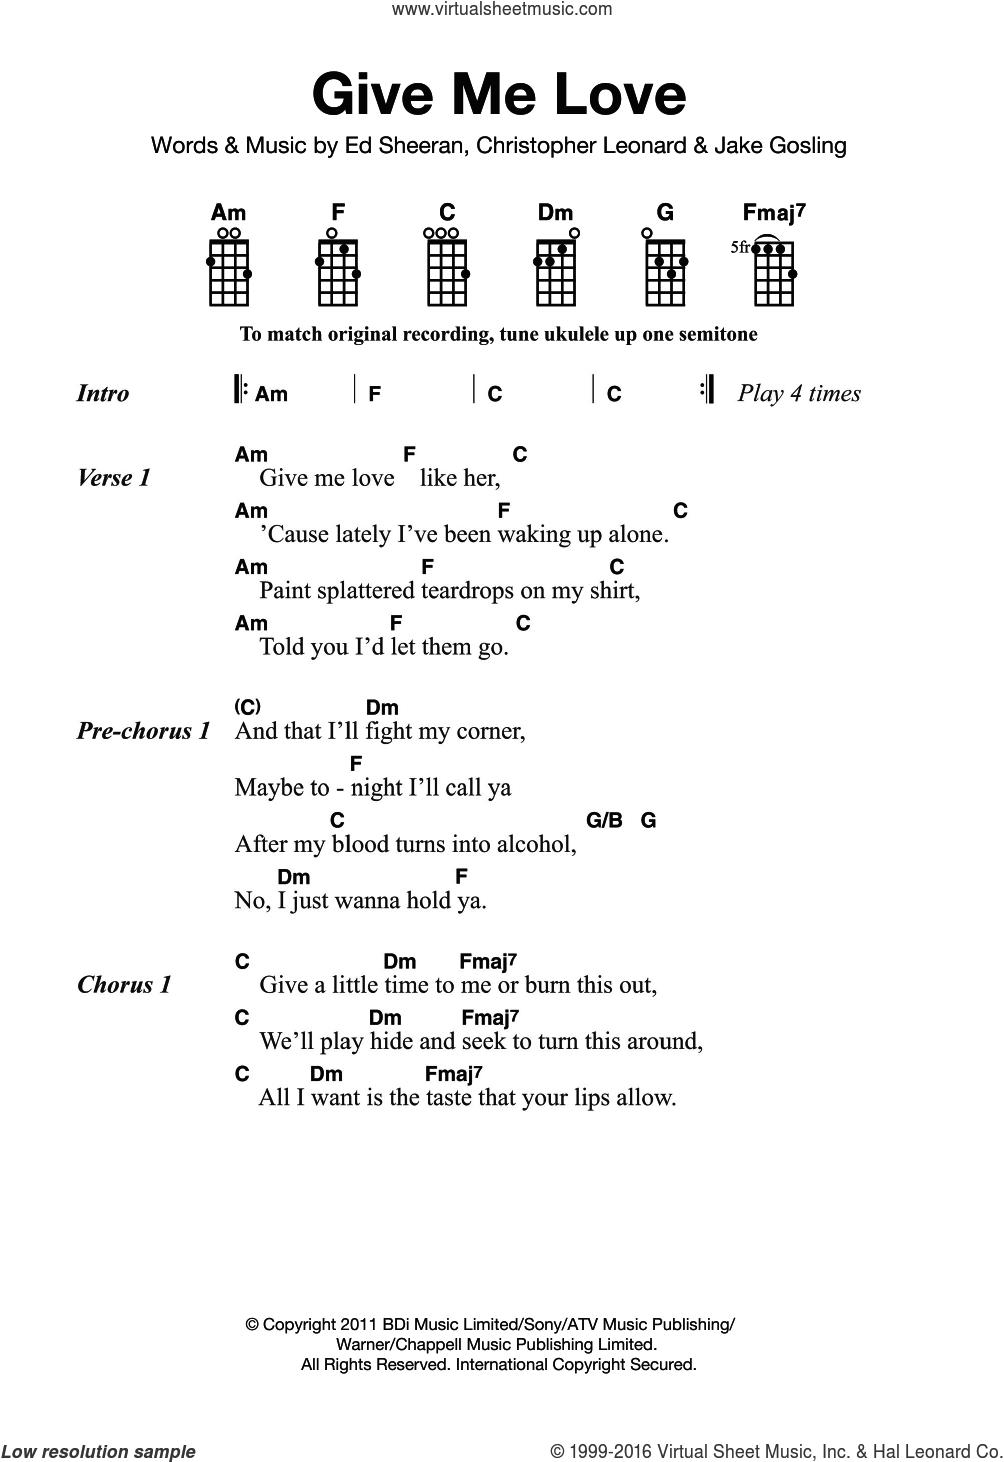 Give Me Love sheet music for ukulele by Ed Sheeran, Christopher Leonard and Jake Gosling, intermediate skill level